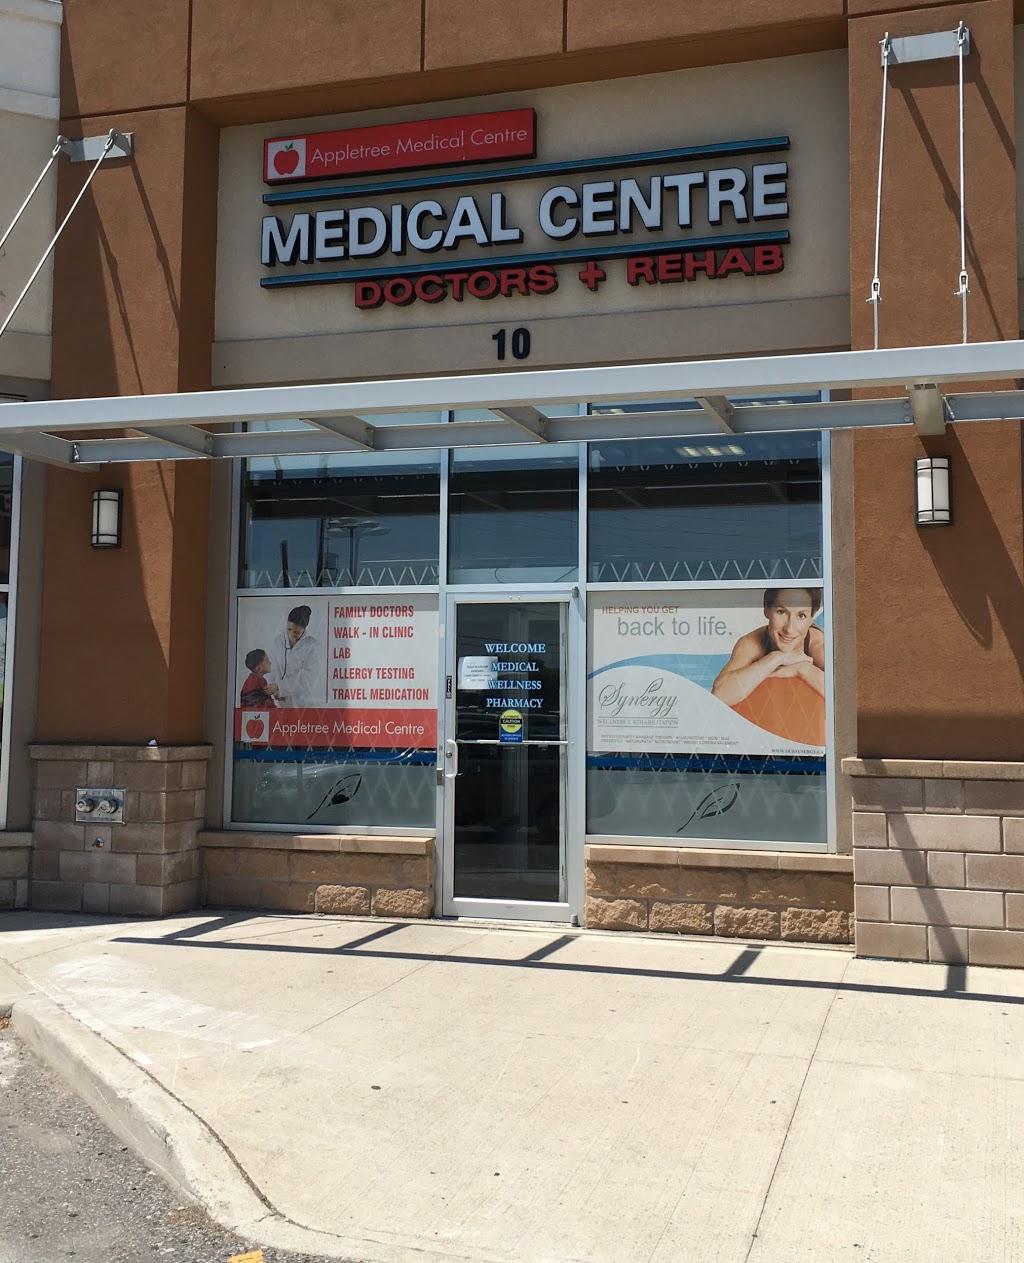 Appletree Medical Centre | doctor | 10-680 Rexdale Blvd, Etobicoke, ON M9W 0B5, Canada | 4162139577 OR +1 416-213-9577